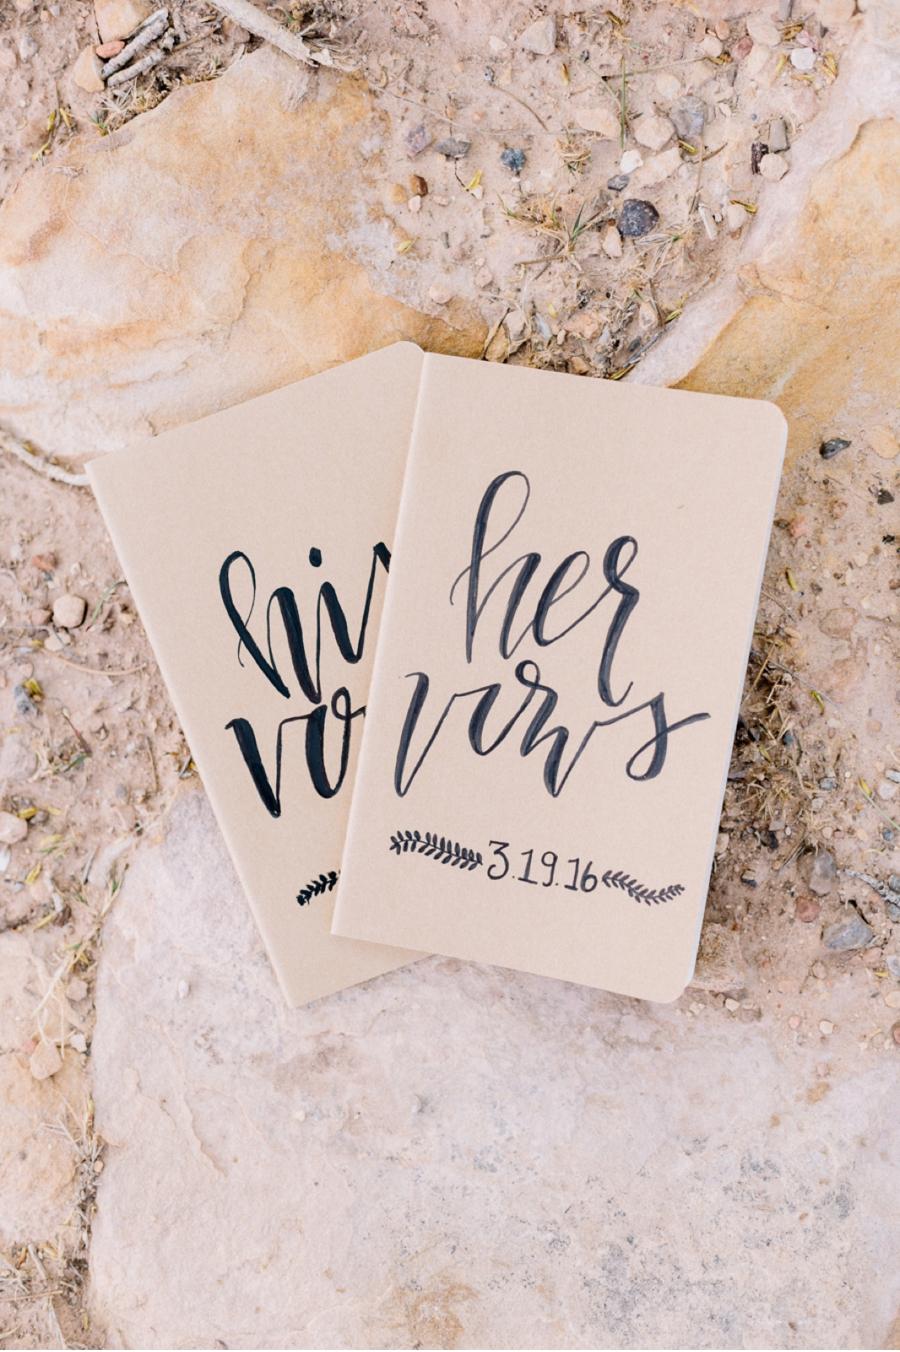 Vow-books-desert-wedding-inspiration